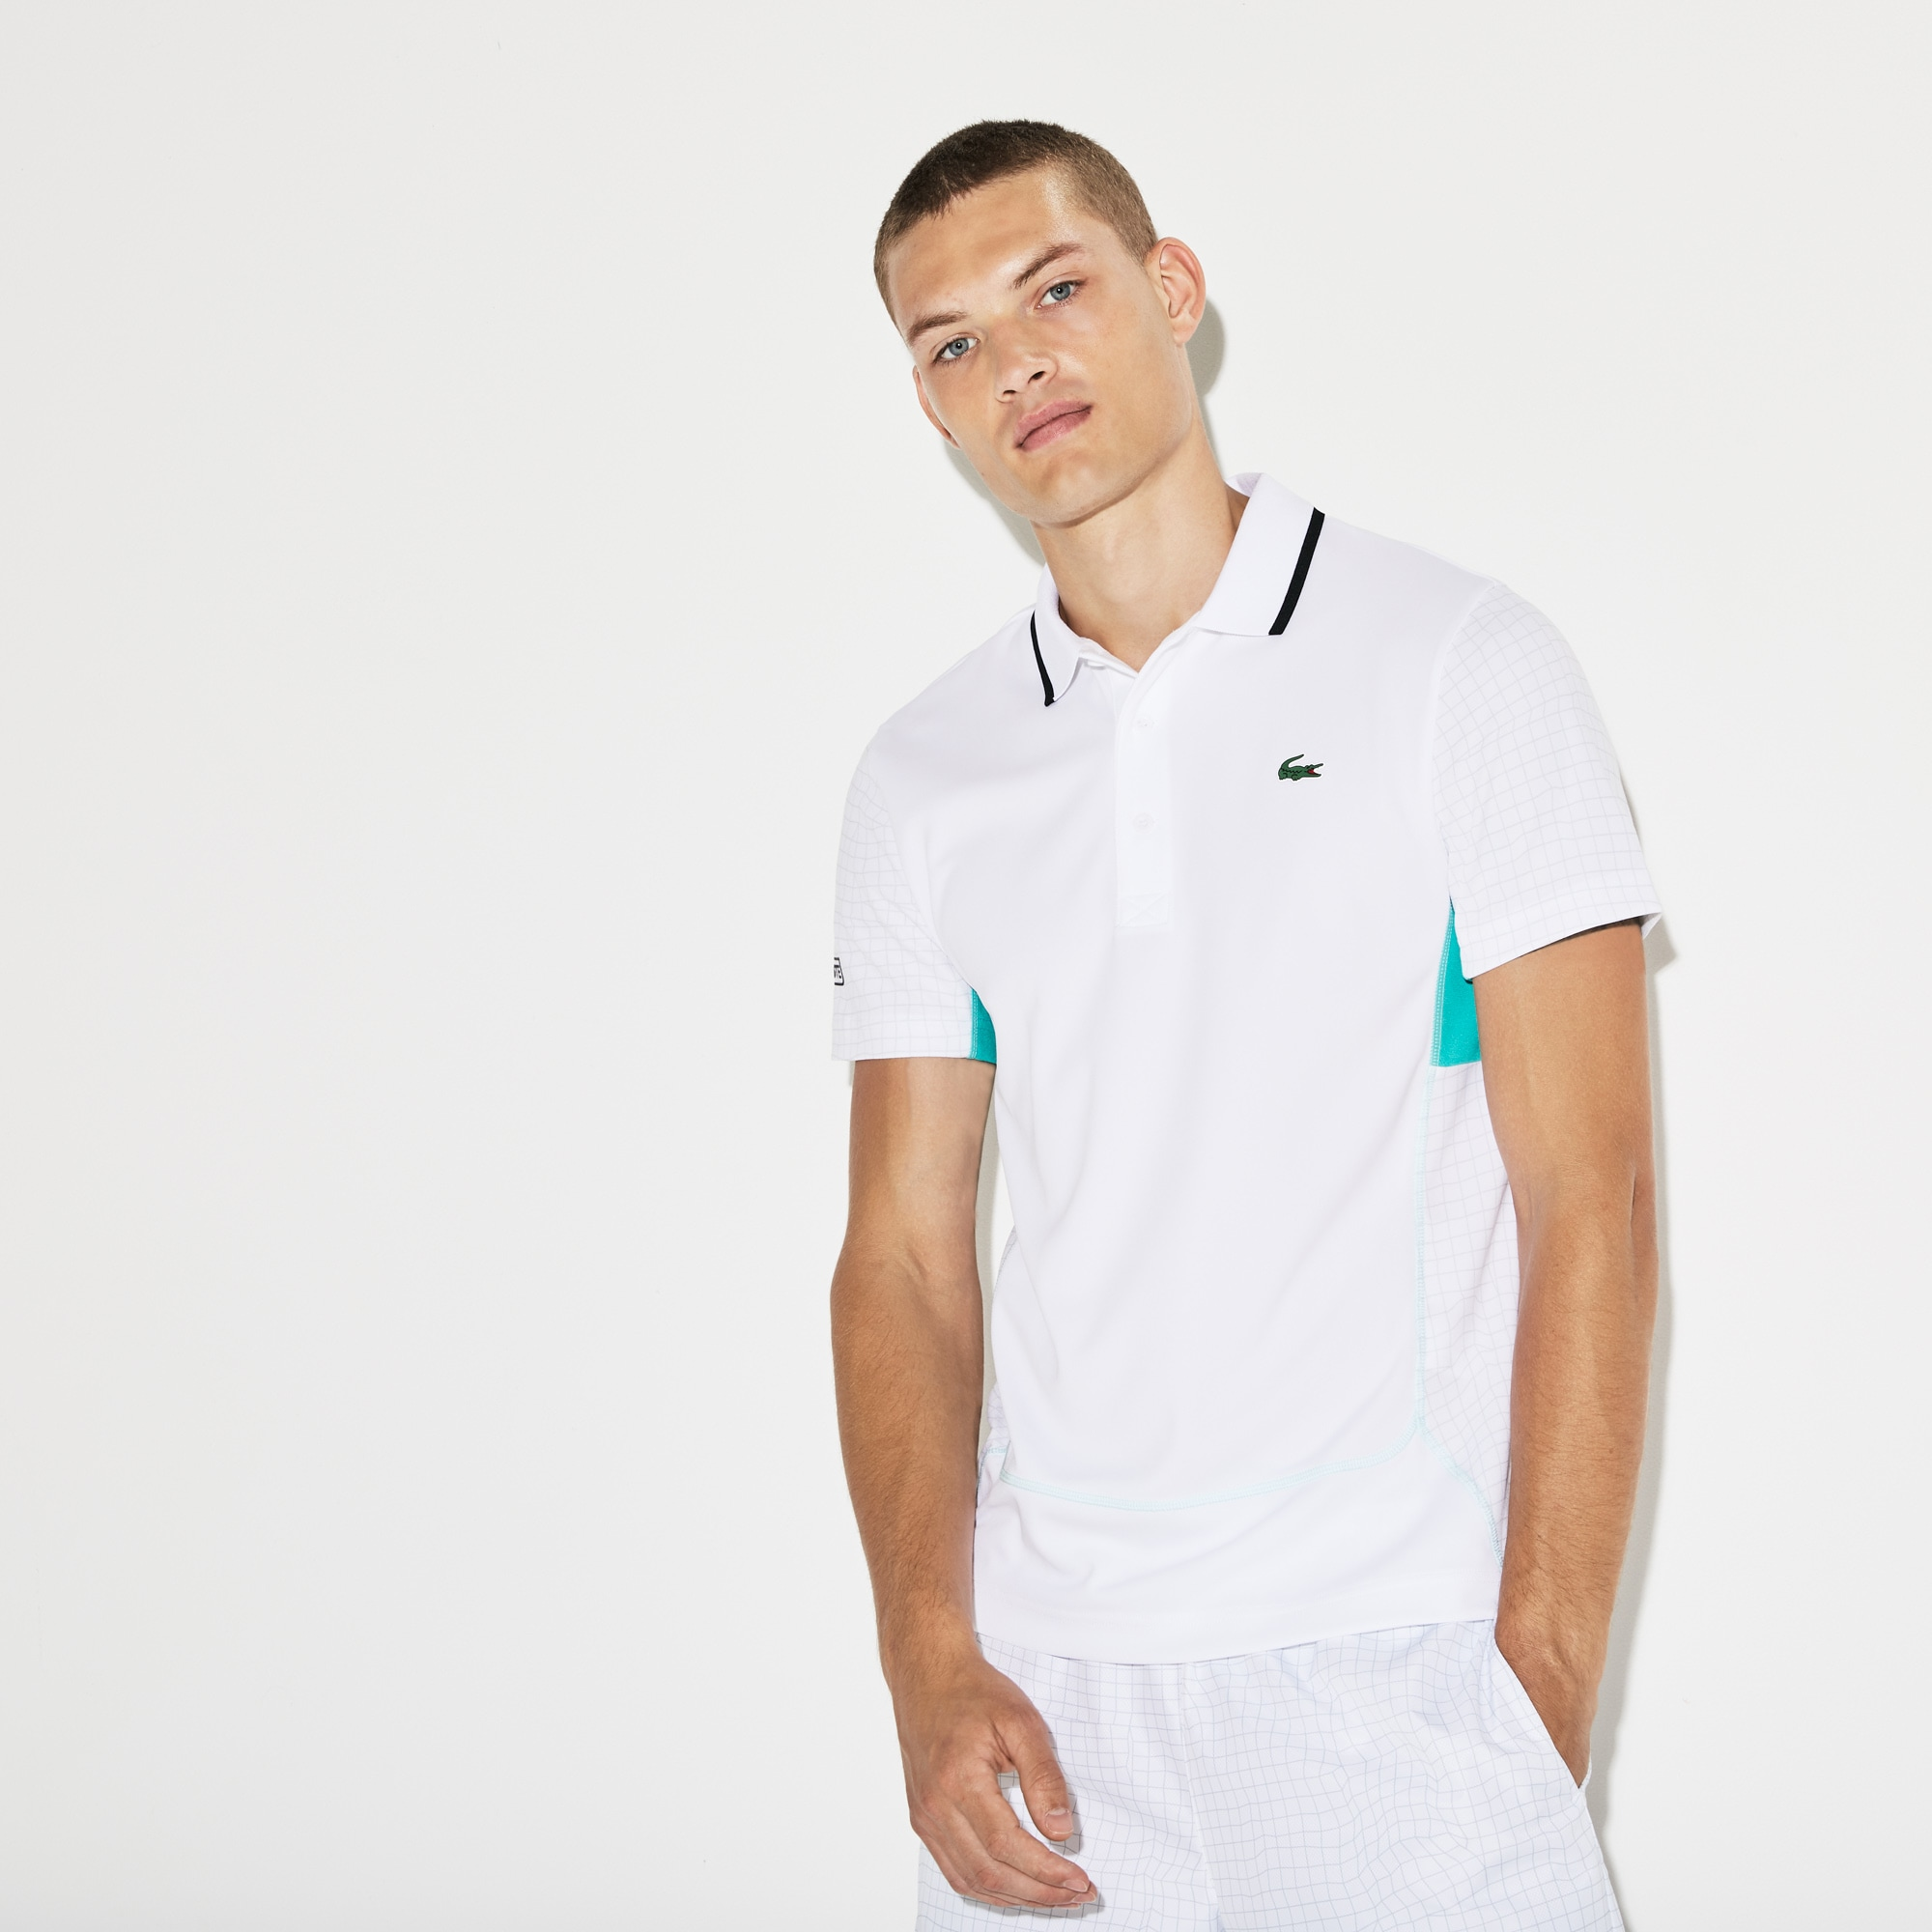 Lacoste SPORT男士网印凸纹网眼面料网球polo衫